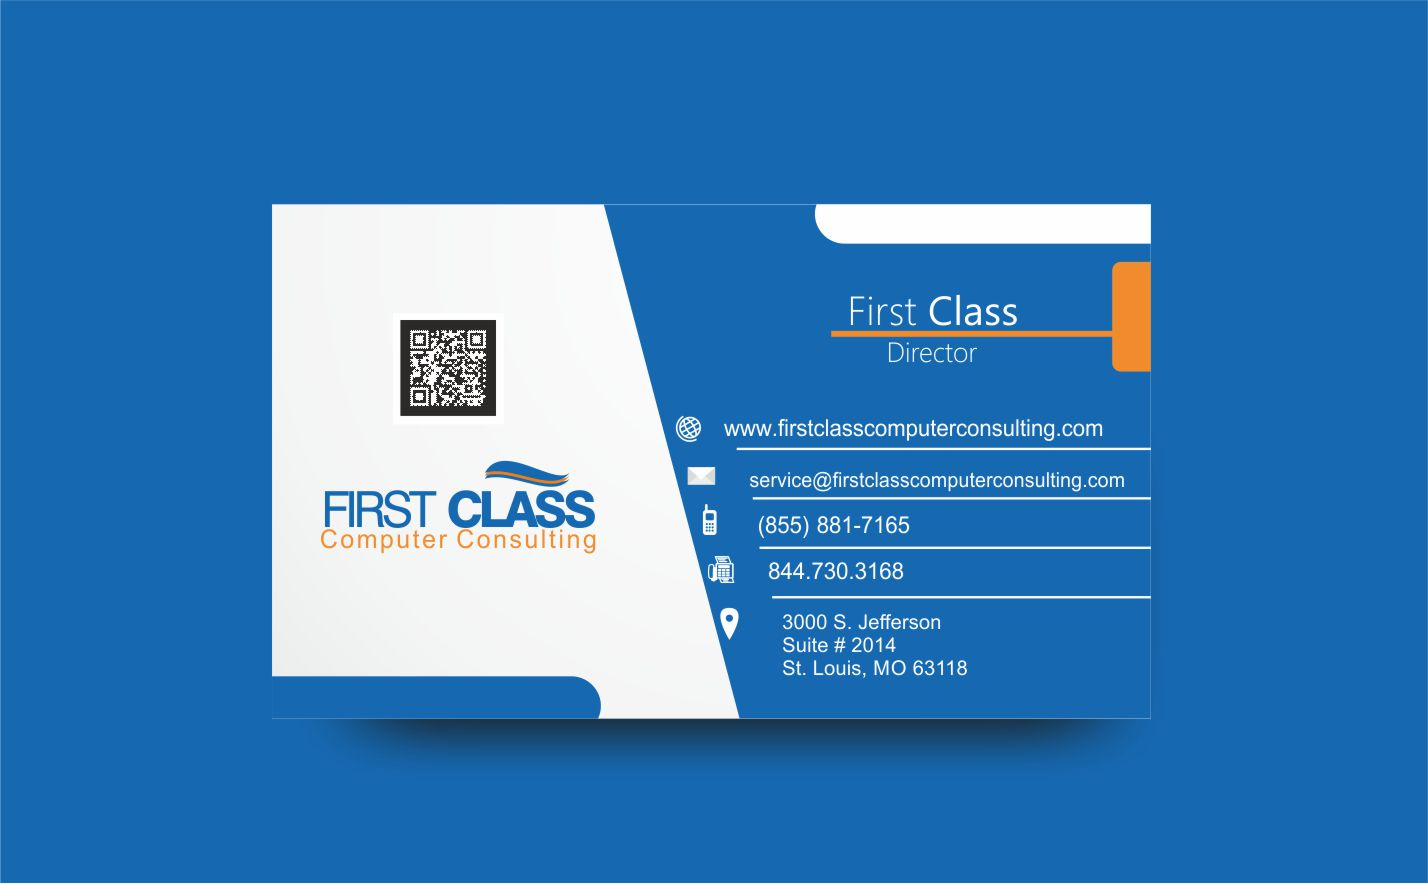 Elegant, Playful Business Card Design for First Class Ventures, LLC ...